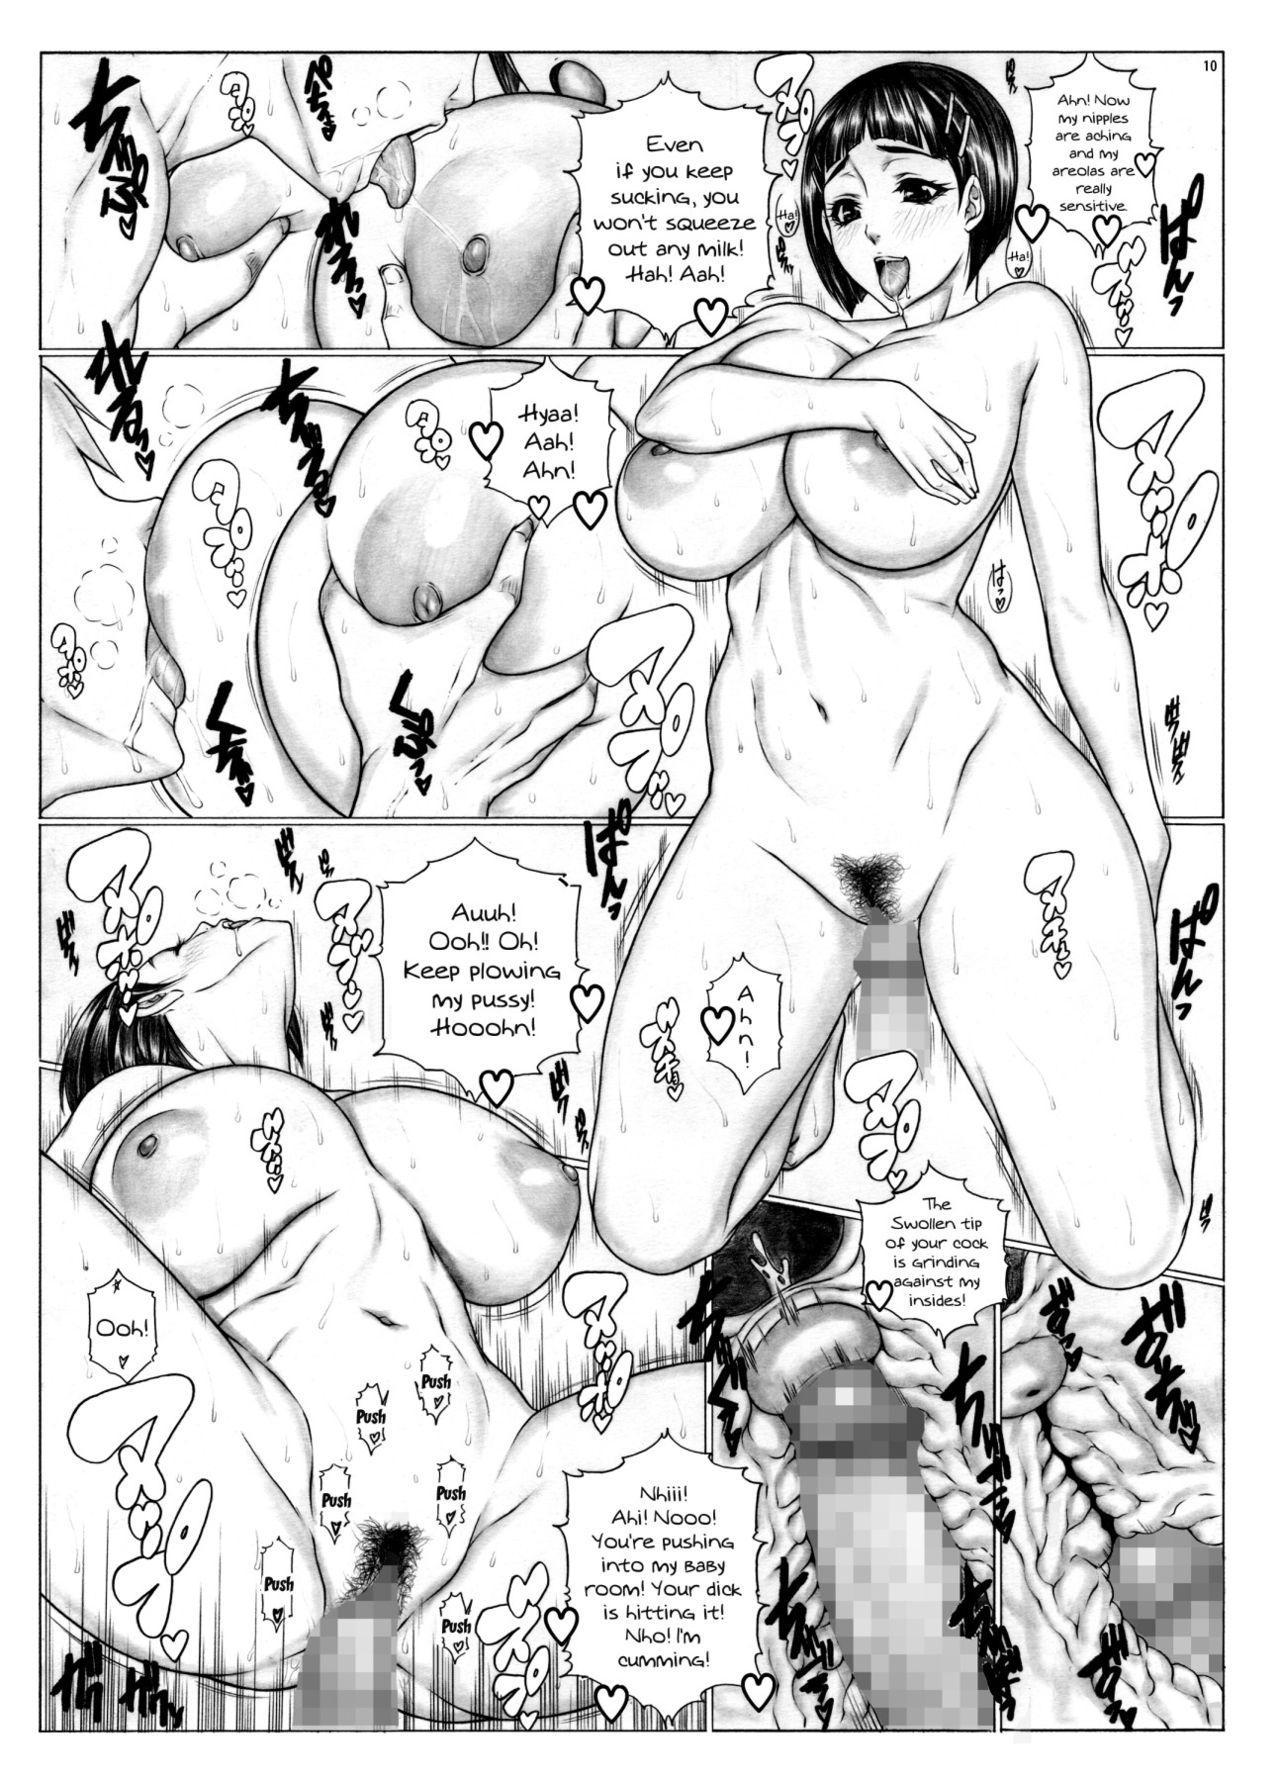 [AXZ (Kutani)] Angel's stroke 124 Sugu Suku 6 - Onii-chan to no Love Love Taikyuu Sex | Angel's stroke 124 Sugu Suku 6 - Lovey Dovey Endurance Sex With Onii-chan (Sword Art Online) [English] {Doujins.com} [Digital] 10